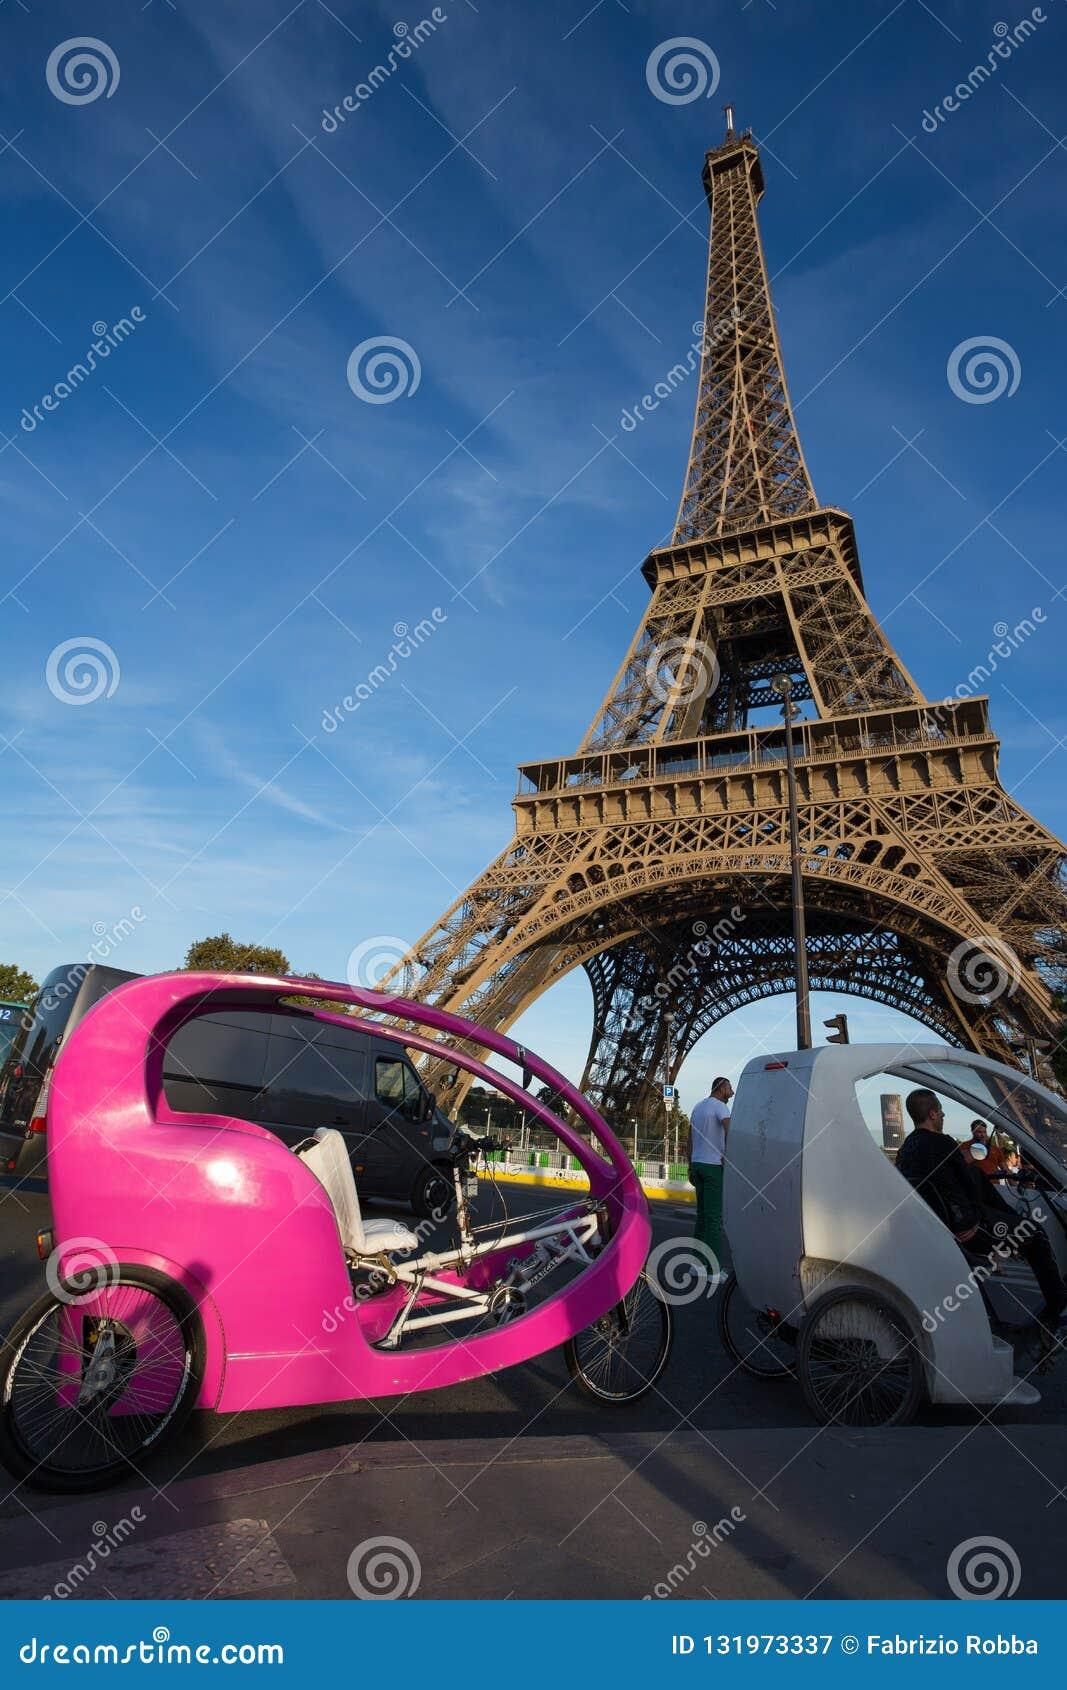 Rickshaws for tourists near Eiffel Tower in Paris, France